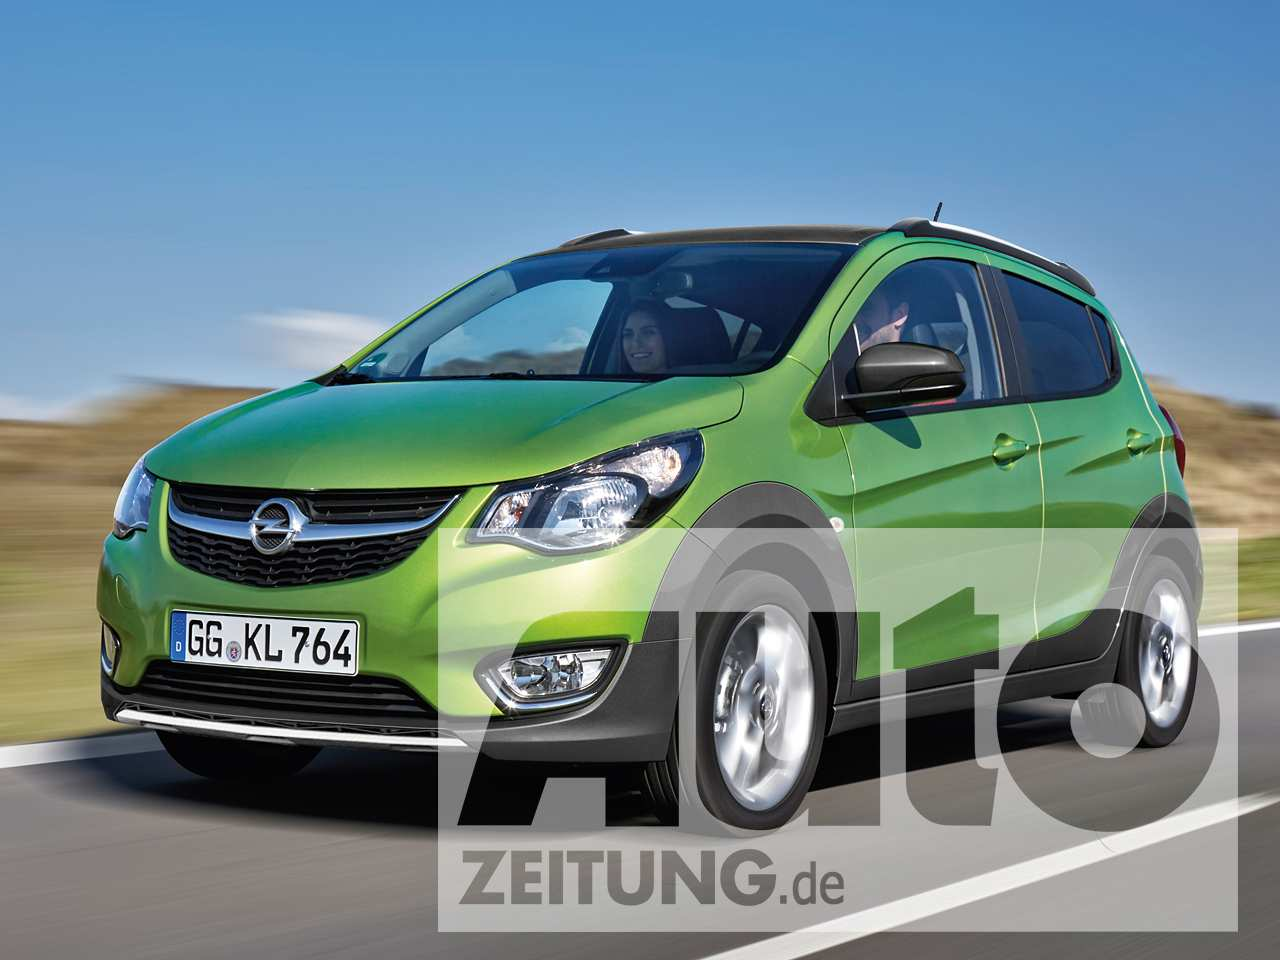 57 Great Neue Opel Bis 2020 First Drive by Neue Opel Bis 2020